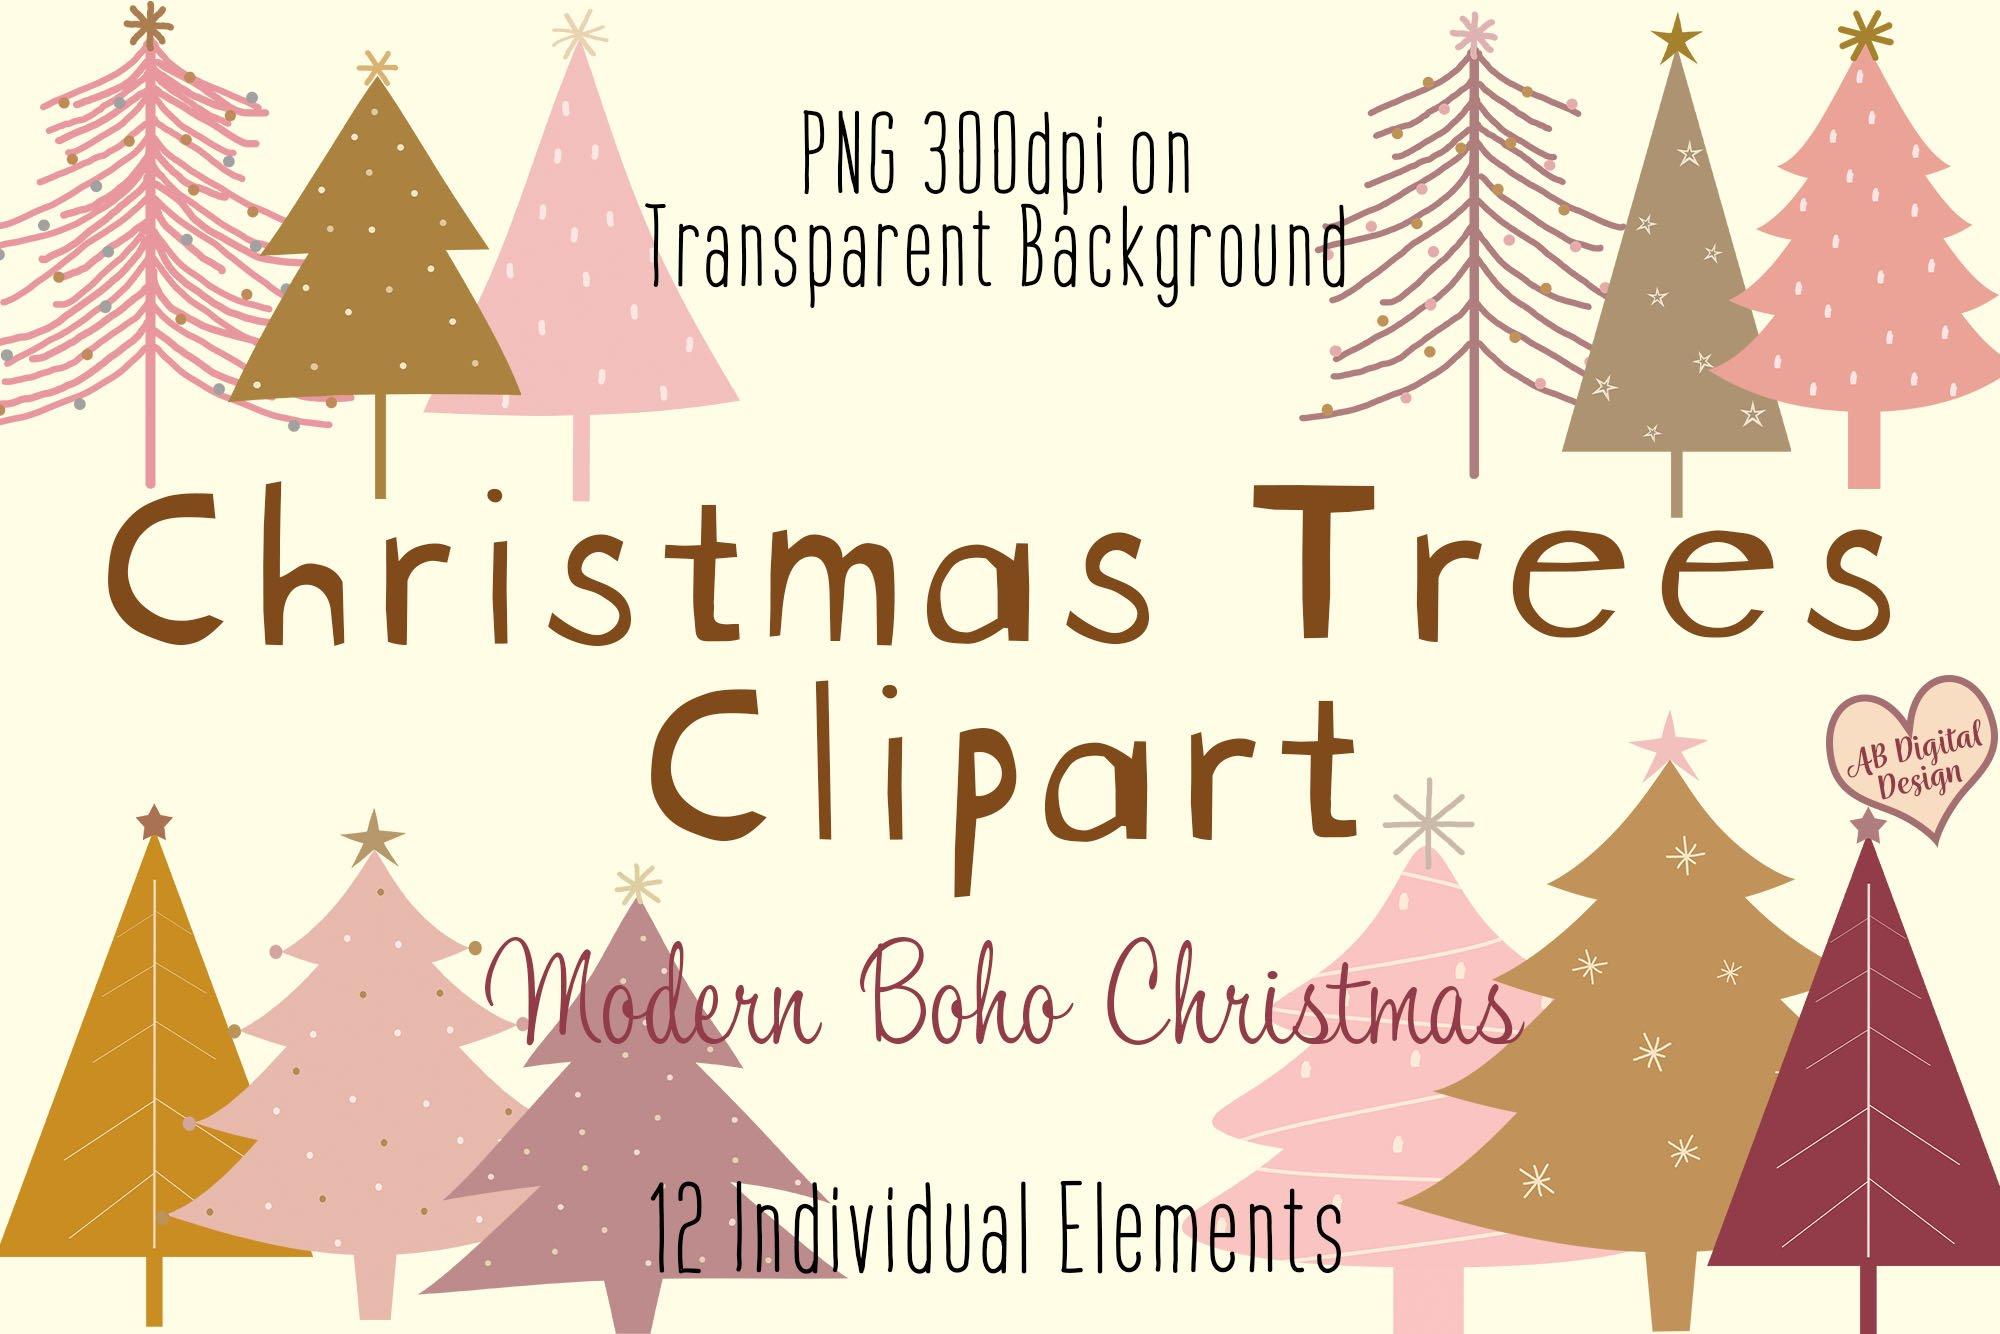 Christmas Tree Clipart Pink Gold Modern Boho Christmas 1037543 Illustrations Design Bundles